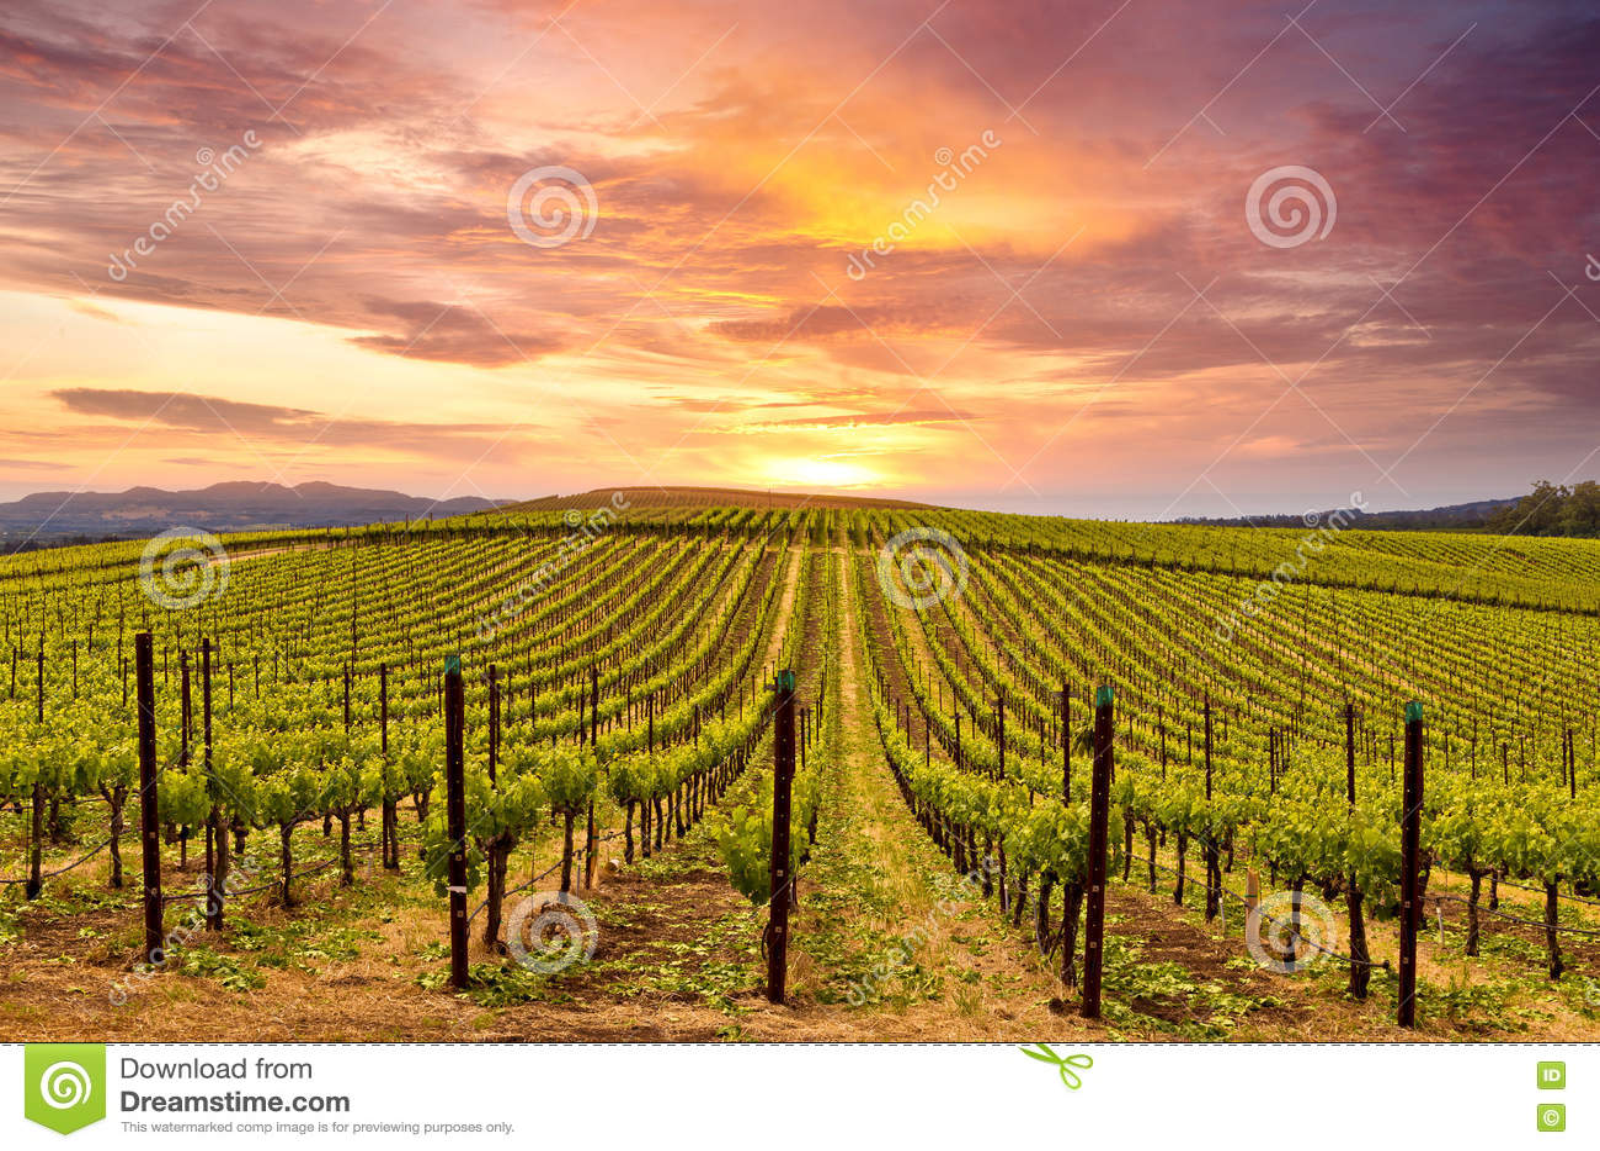 Napa Valley Vineyards Spring Sunset